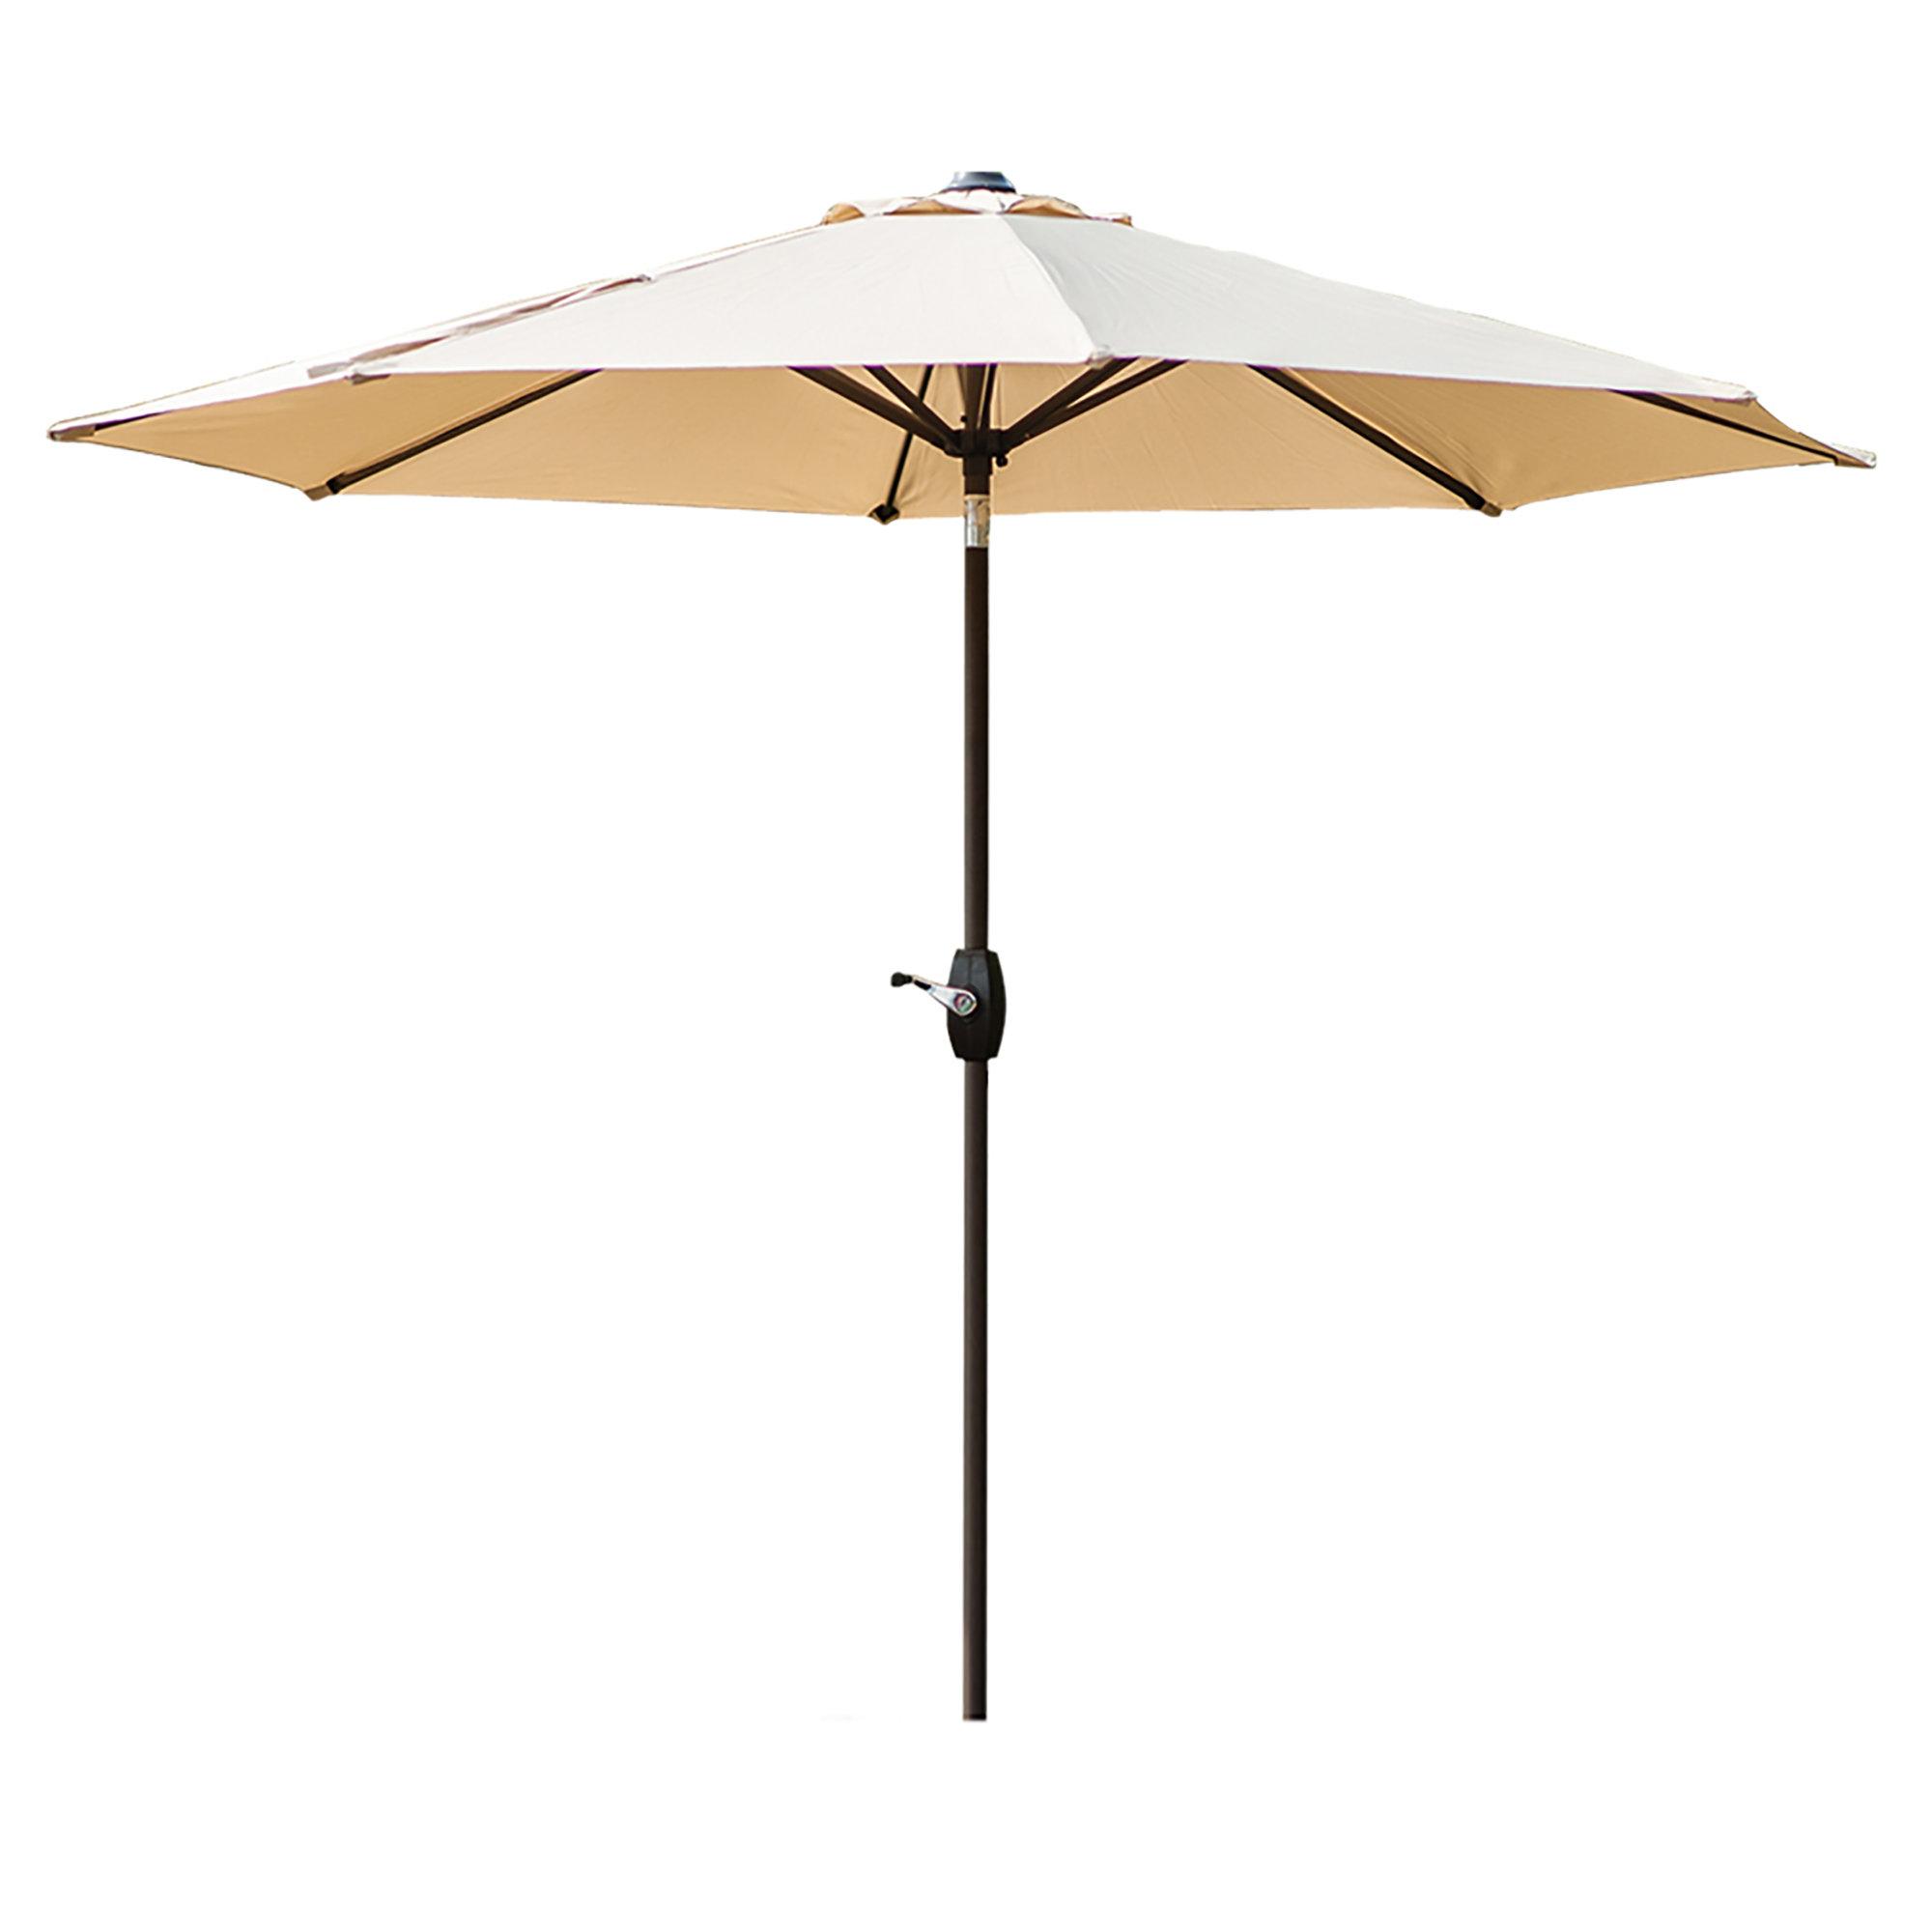 Charlton Home Kenn 9' Market Umbrella Inside Recent Hyperion Market Umbrellas (View 6 of 20)